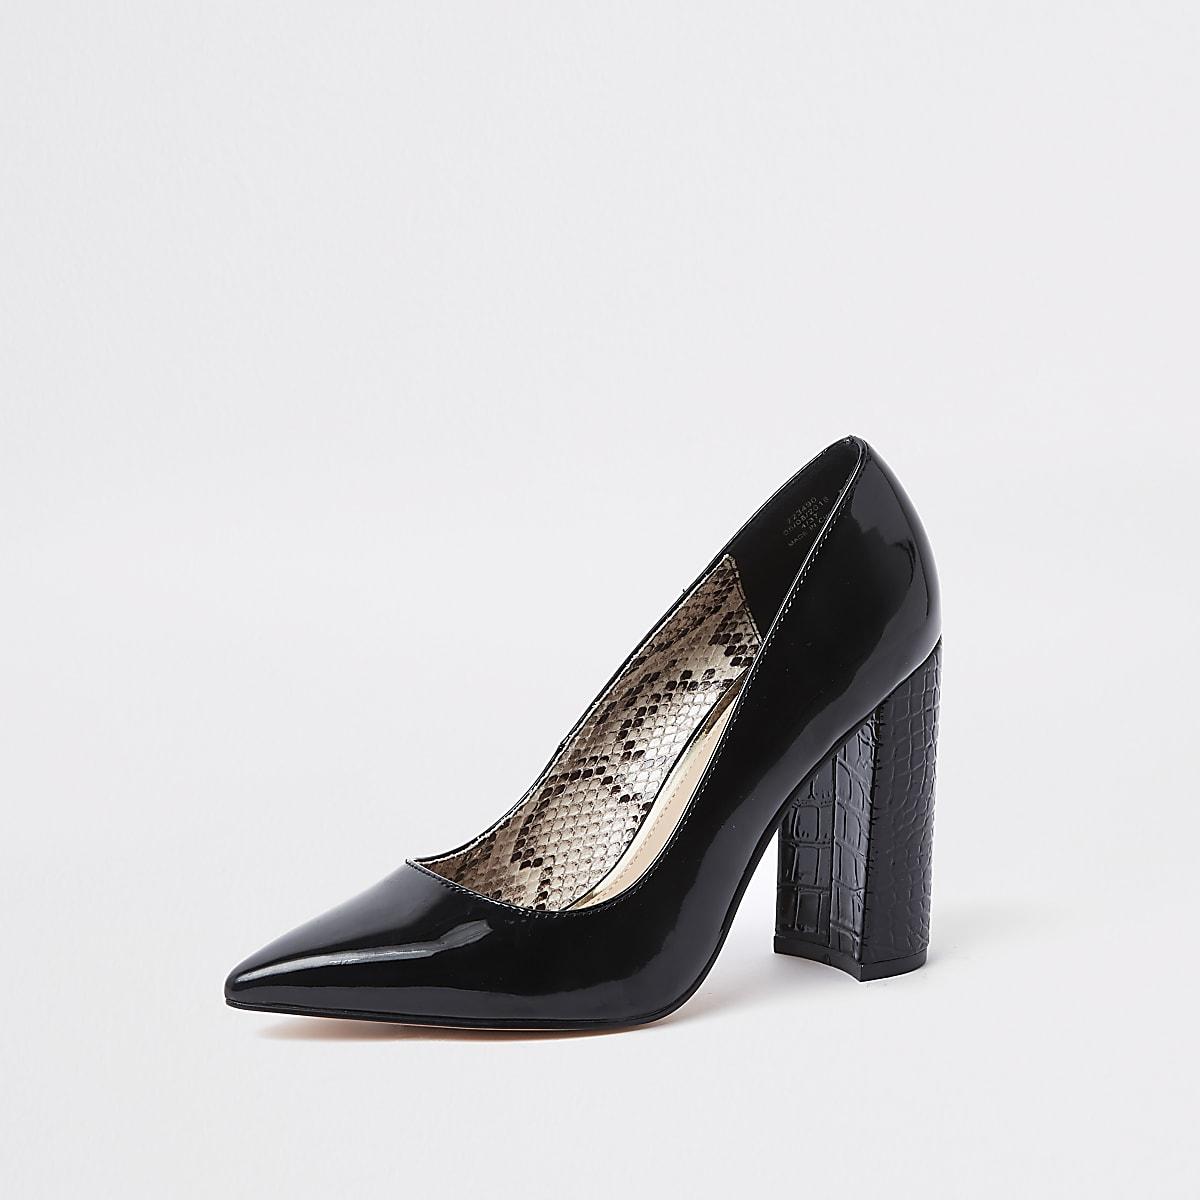 5477c7d2e72 Black wrap around block heel court shoes